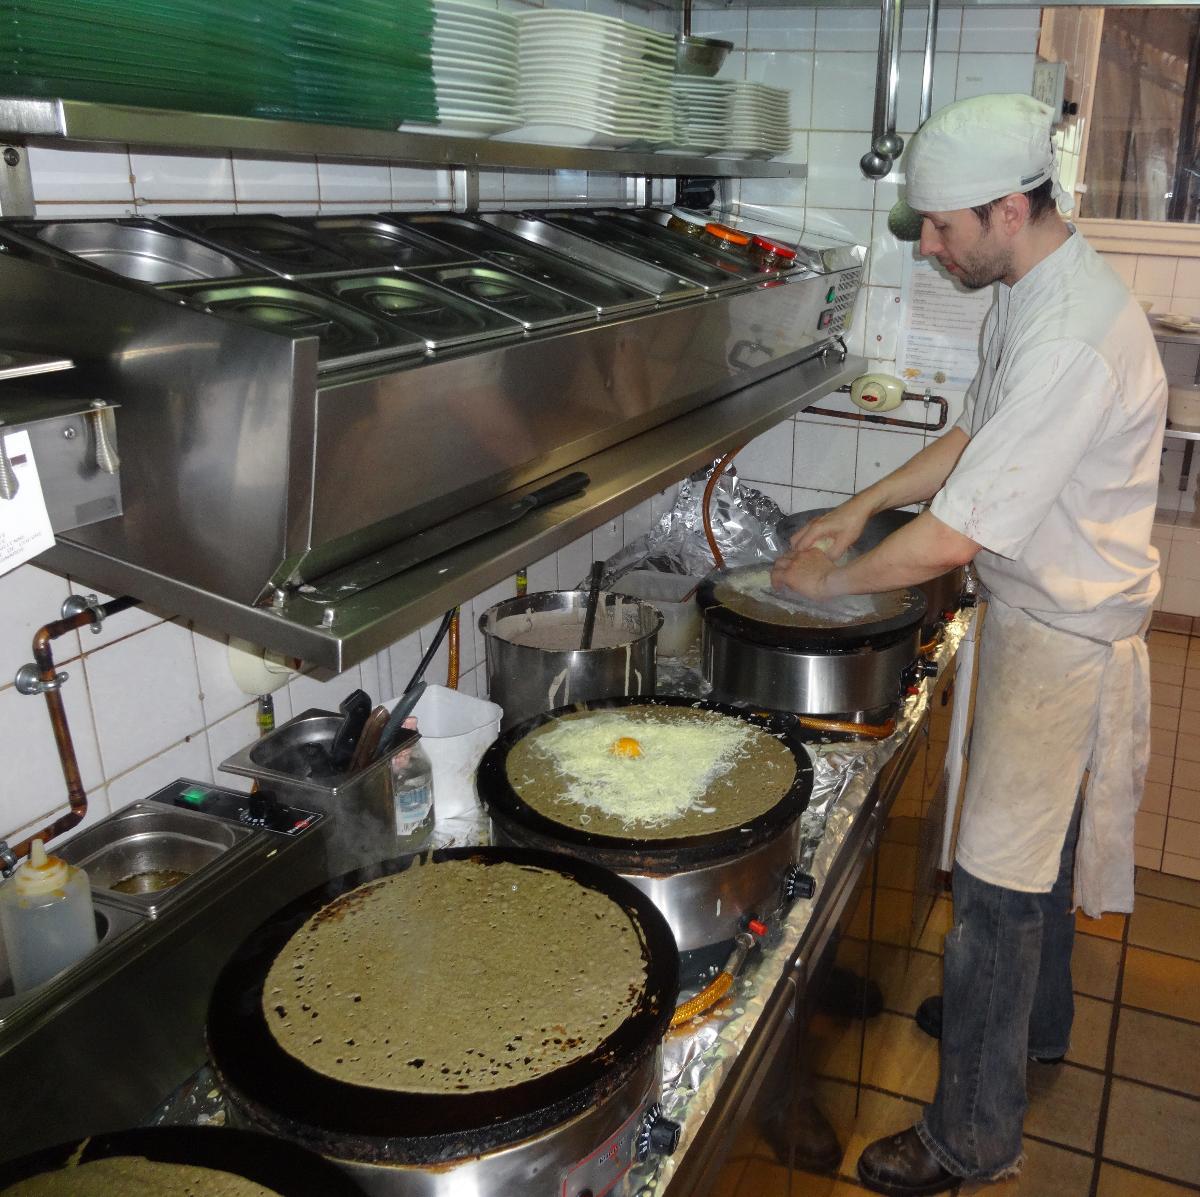 Crêperie Artisanale Ty Skorn Cancale - Restaurant